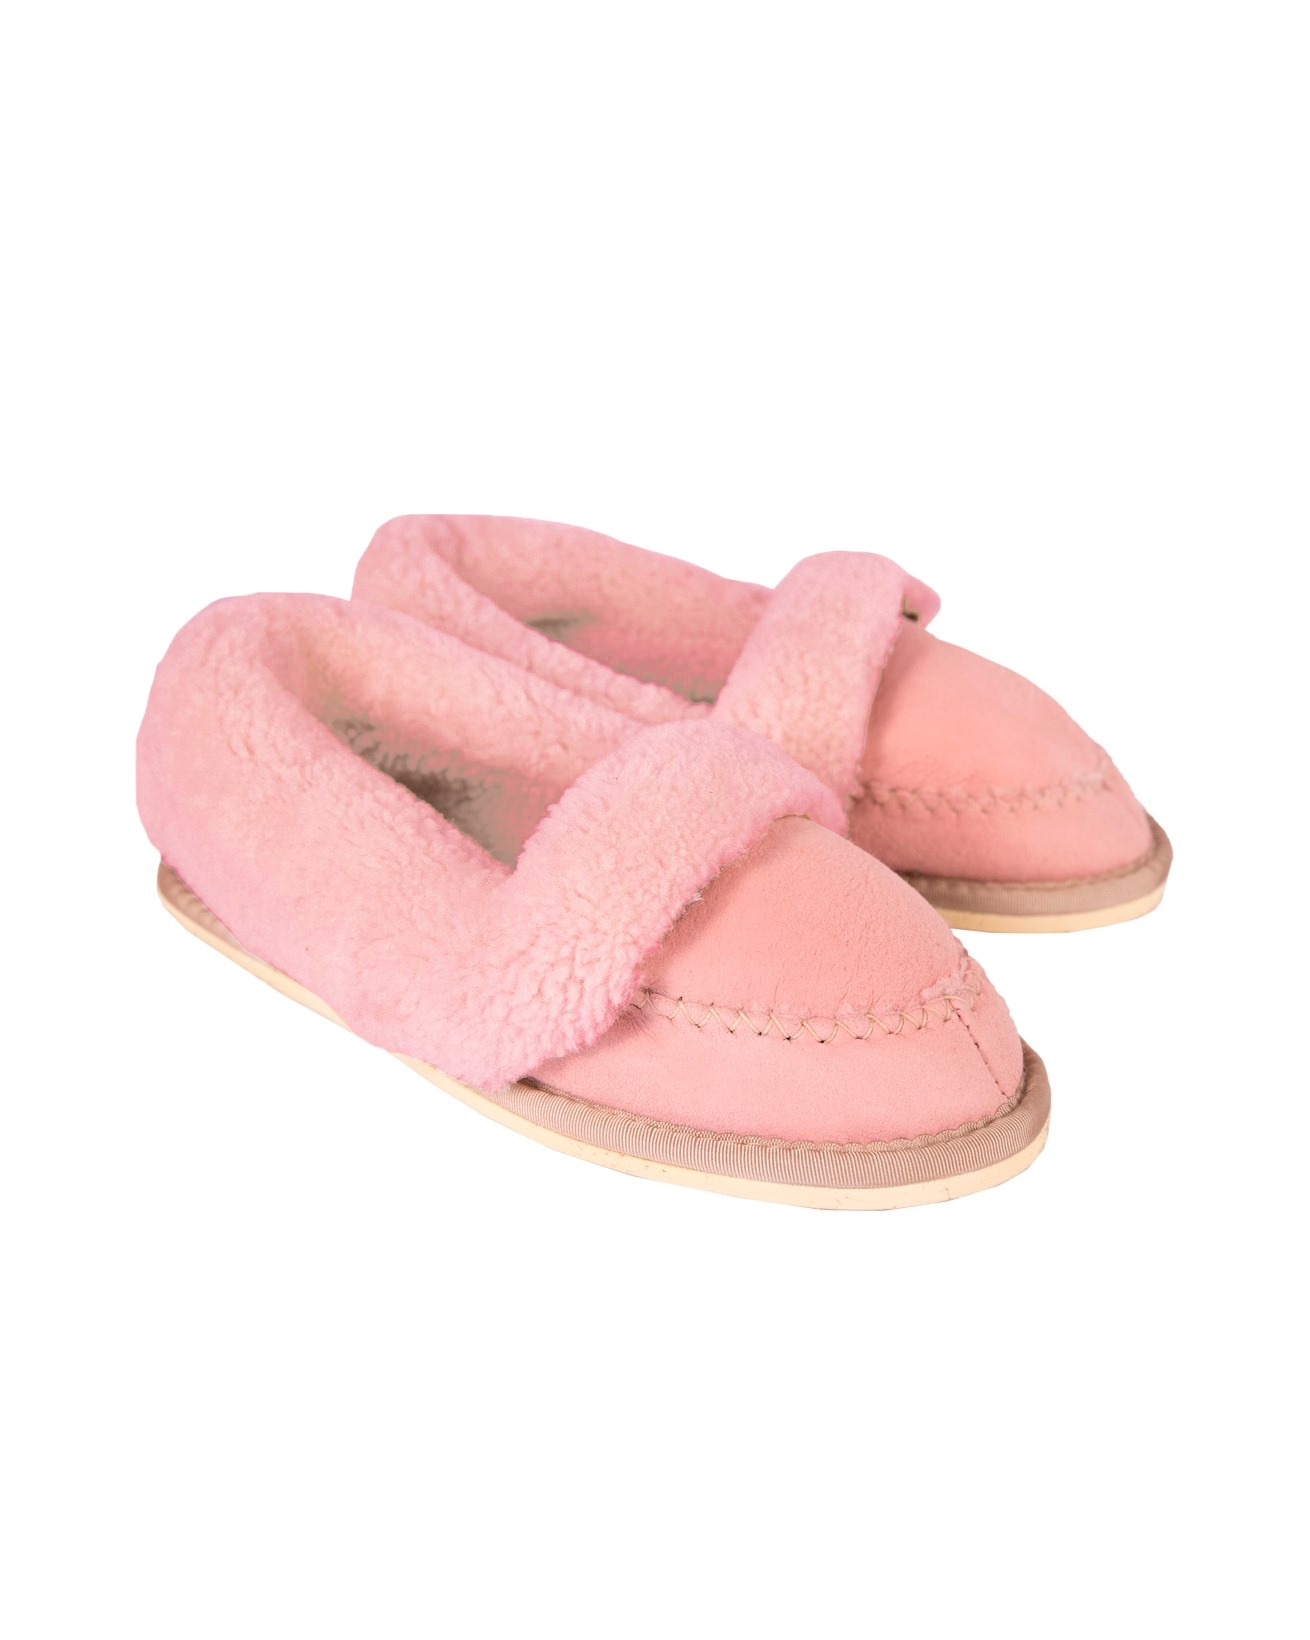 Ladies Halona Slipper - Size 5 - Pink - 126